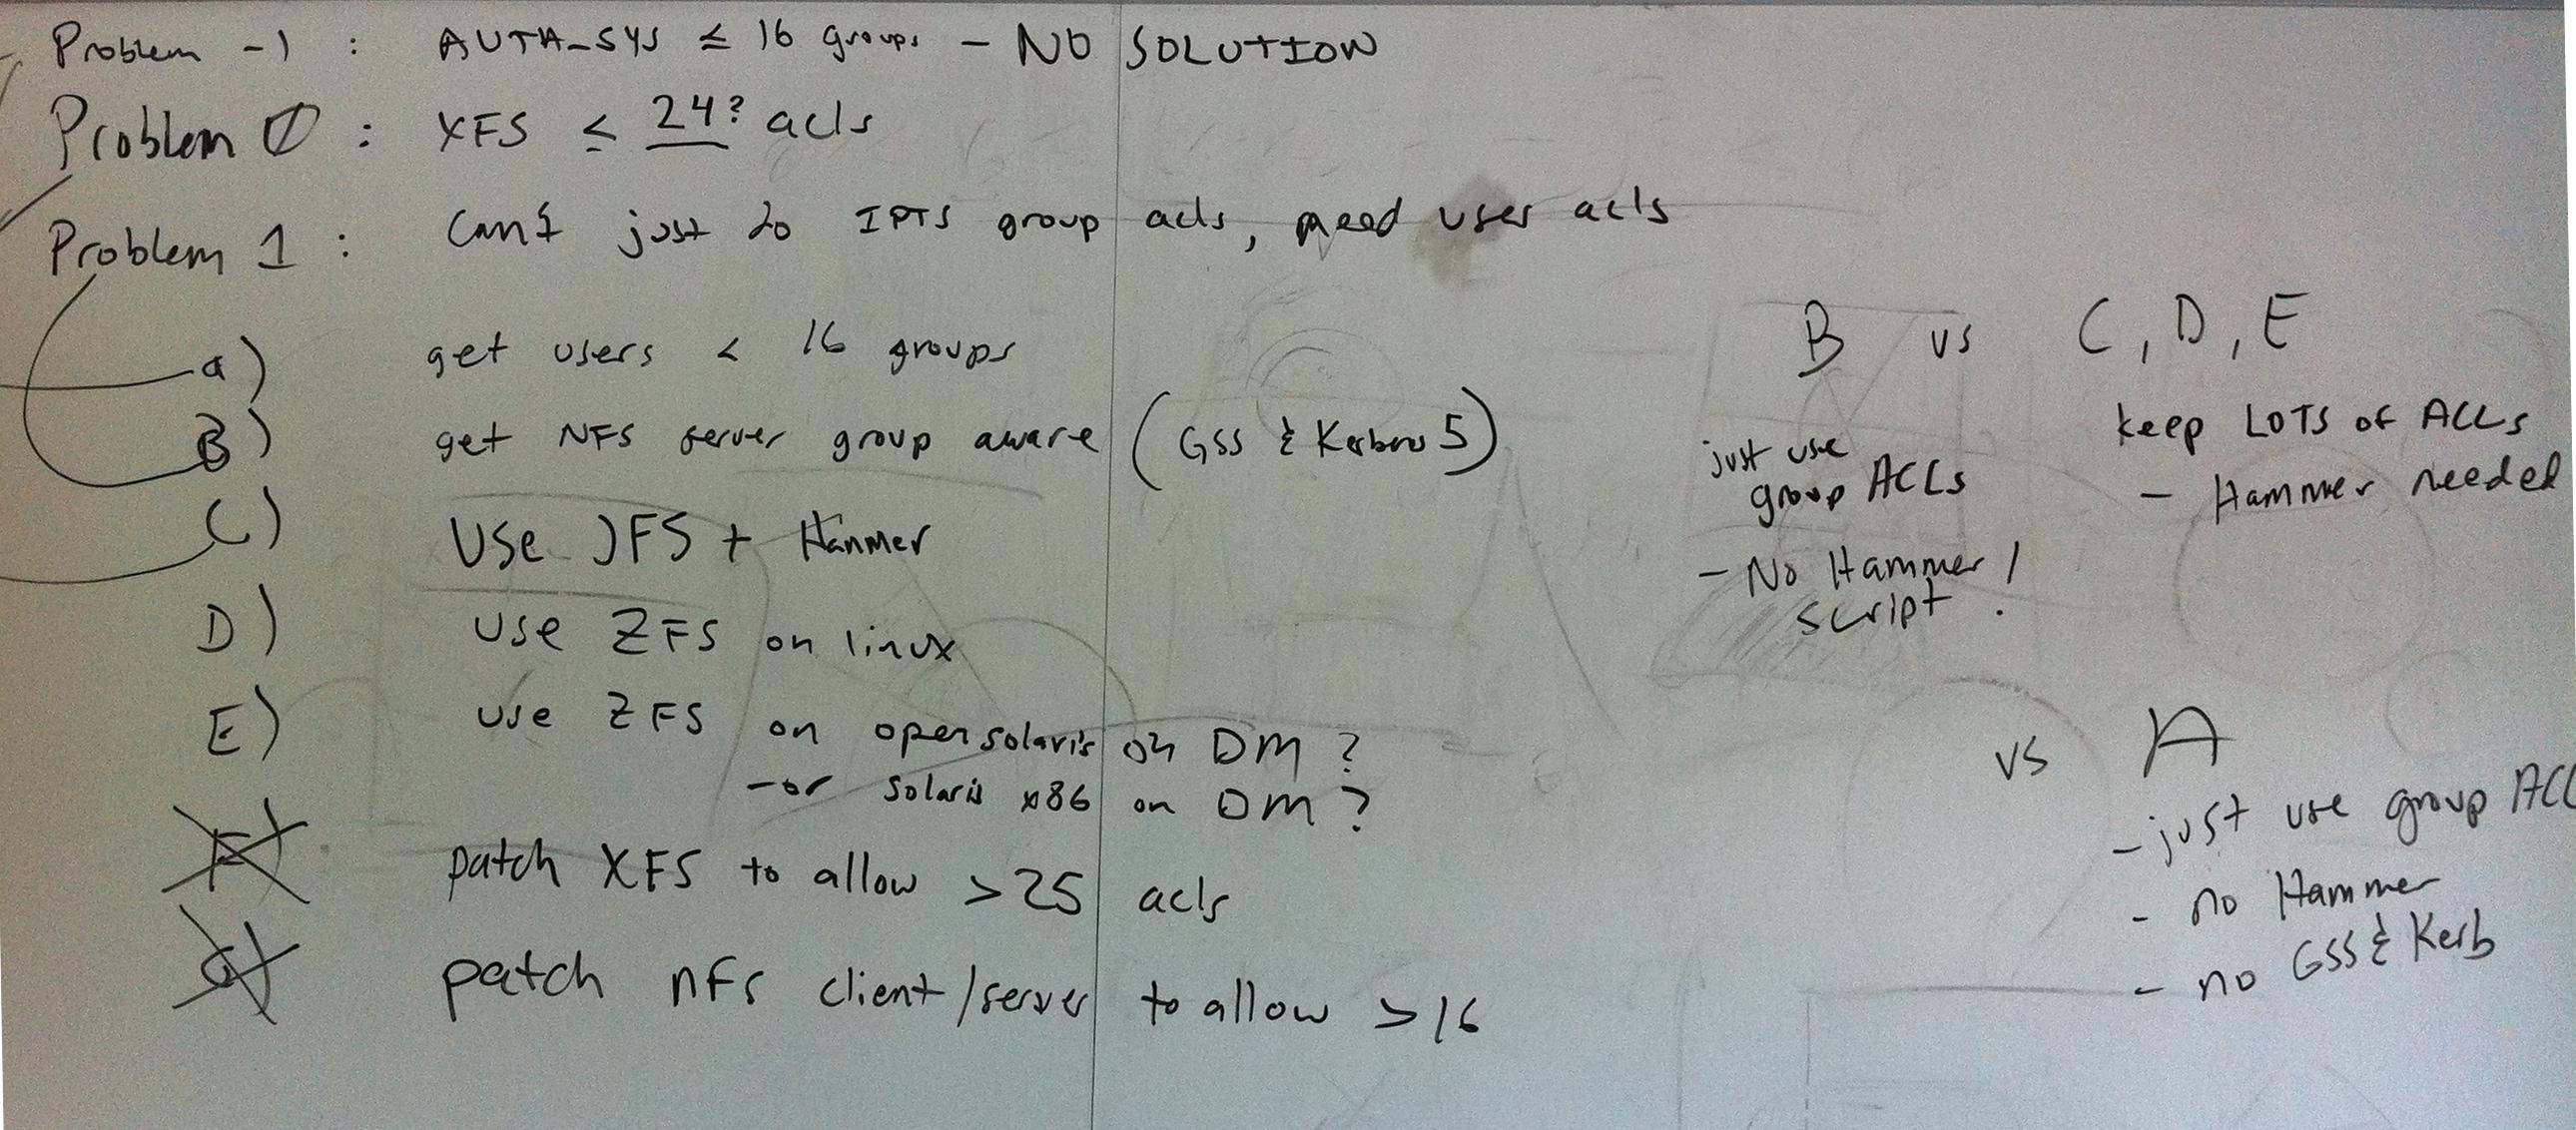 acls post test answer key pdf